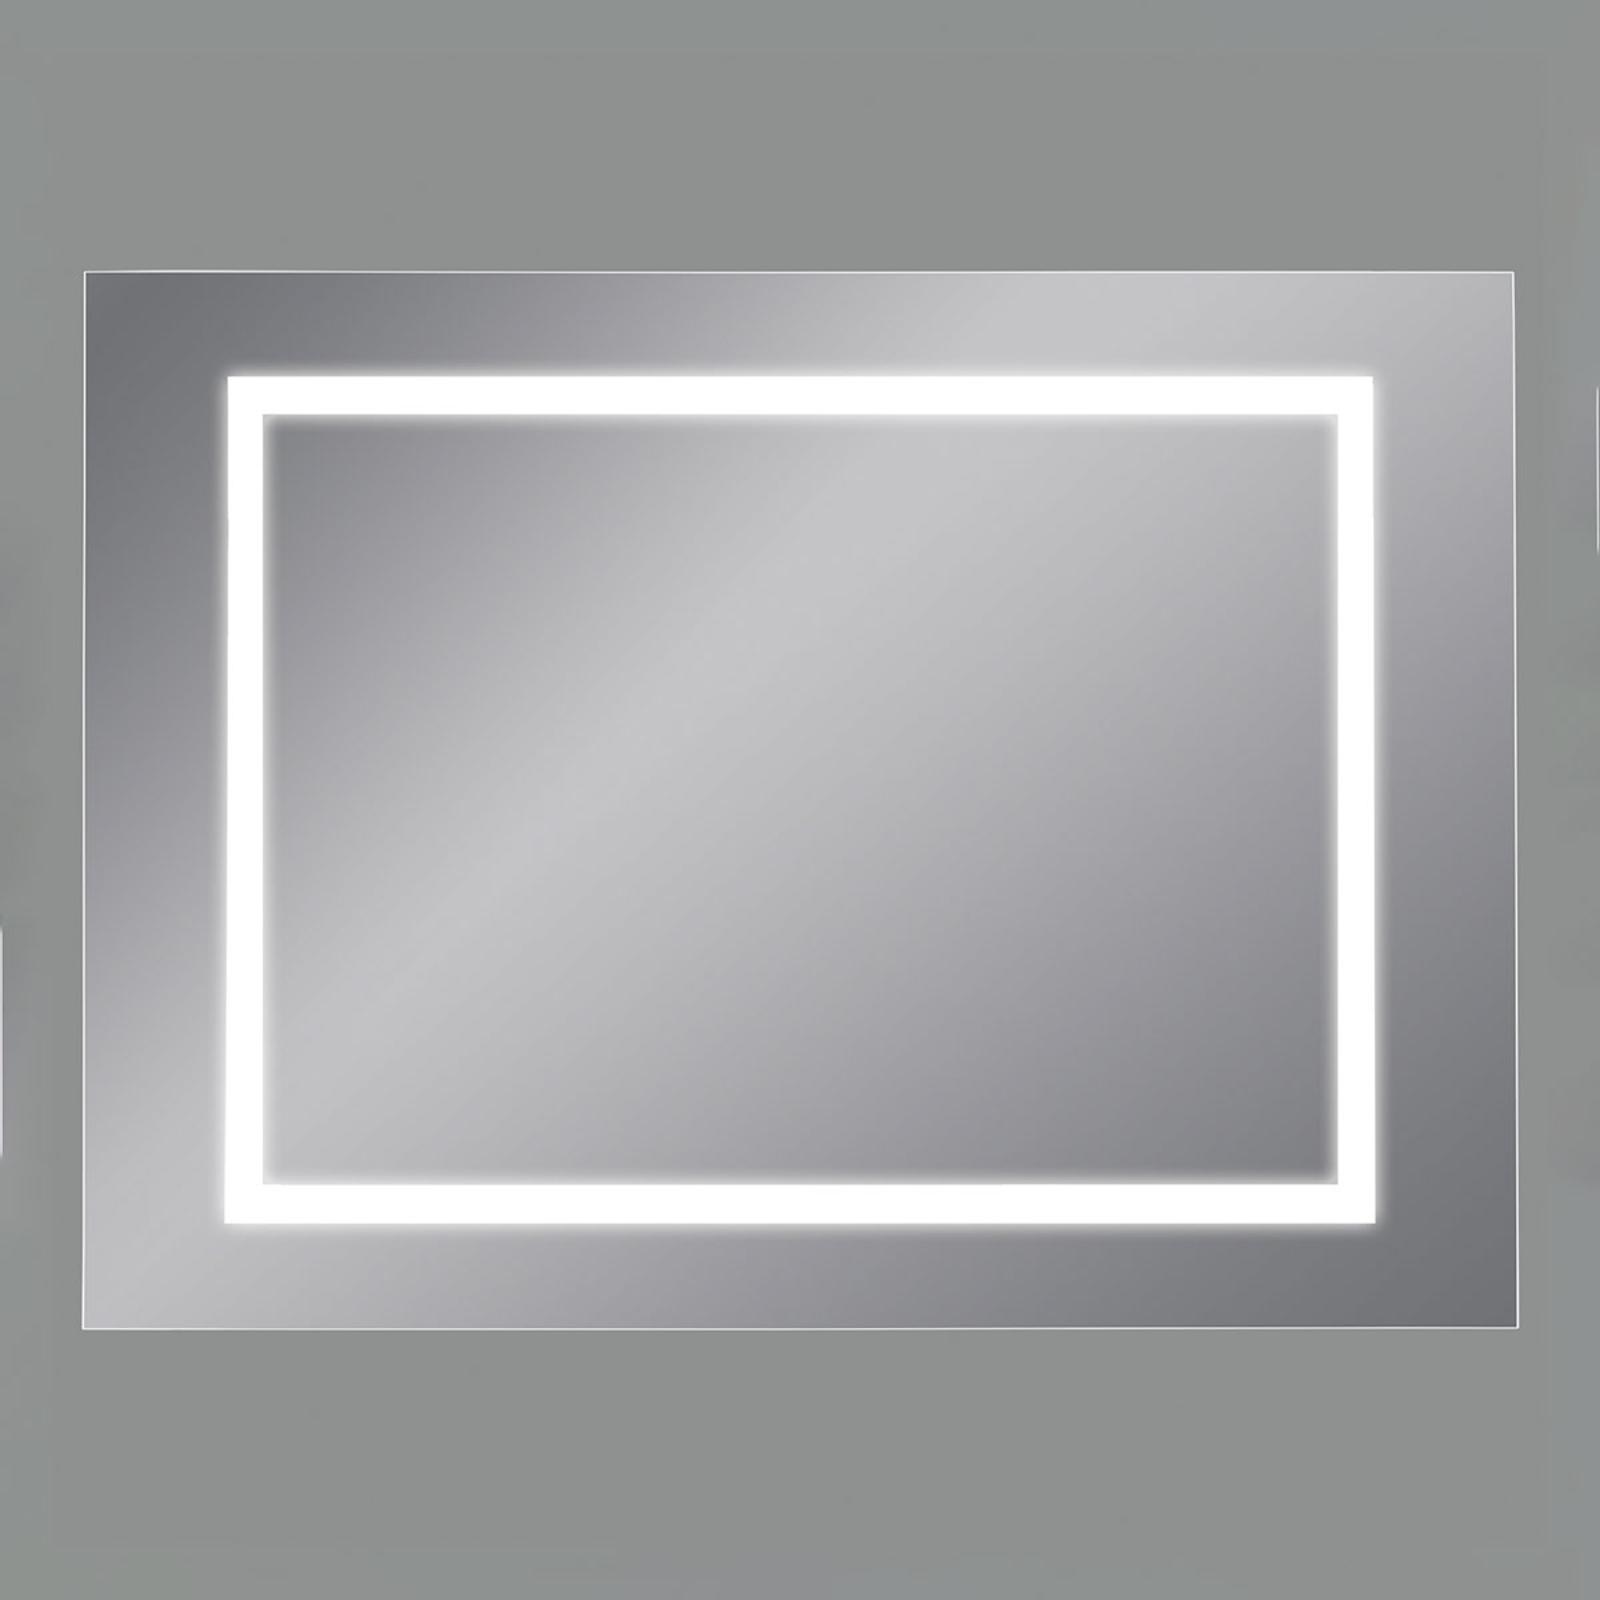 LED-Wandspiegel Mul, 110x75 cm, 3.000 K